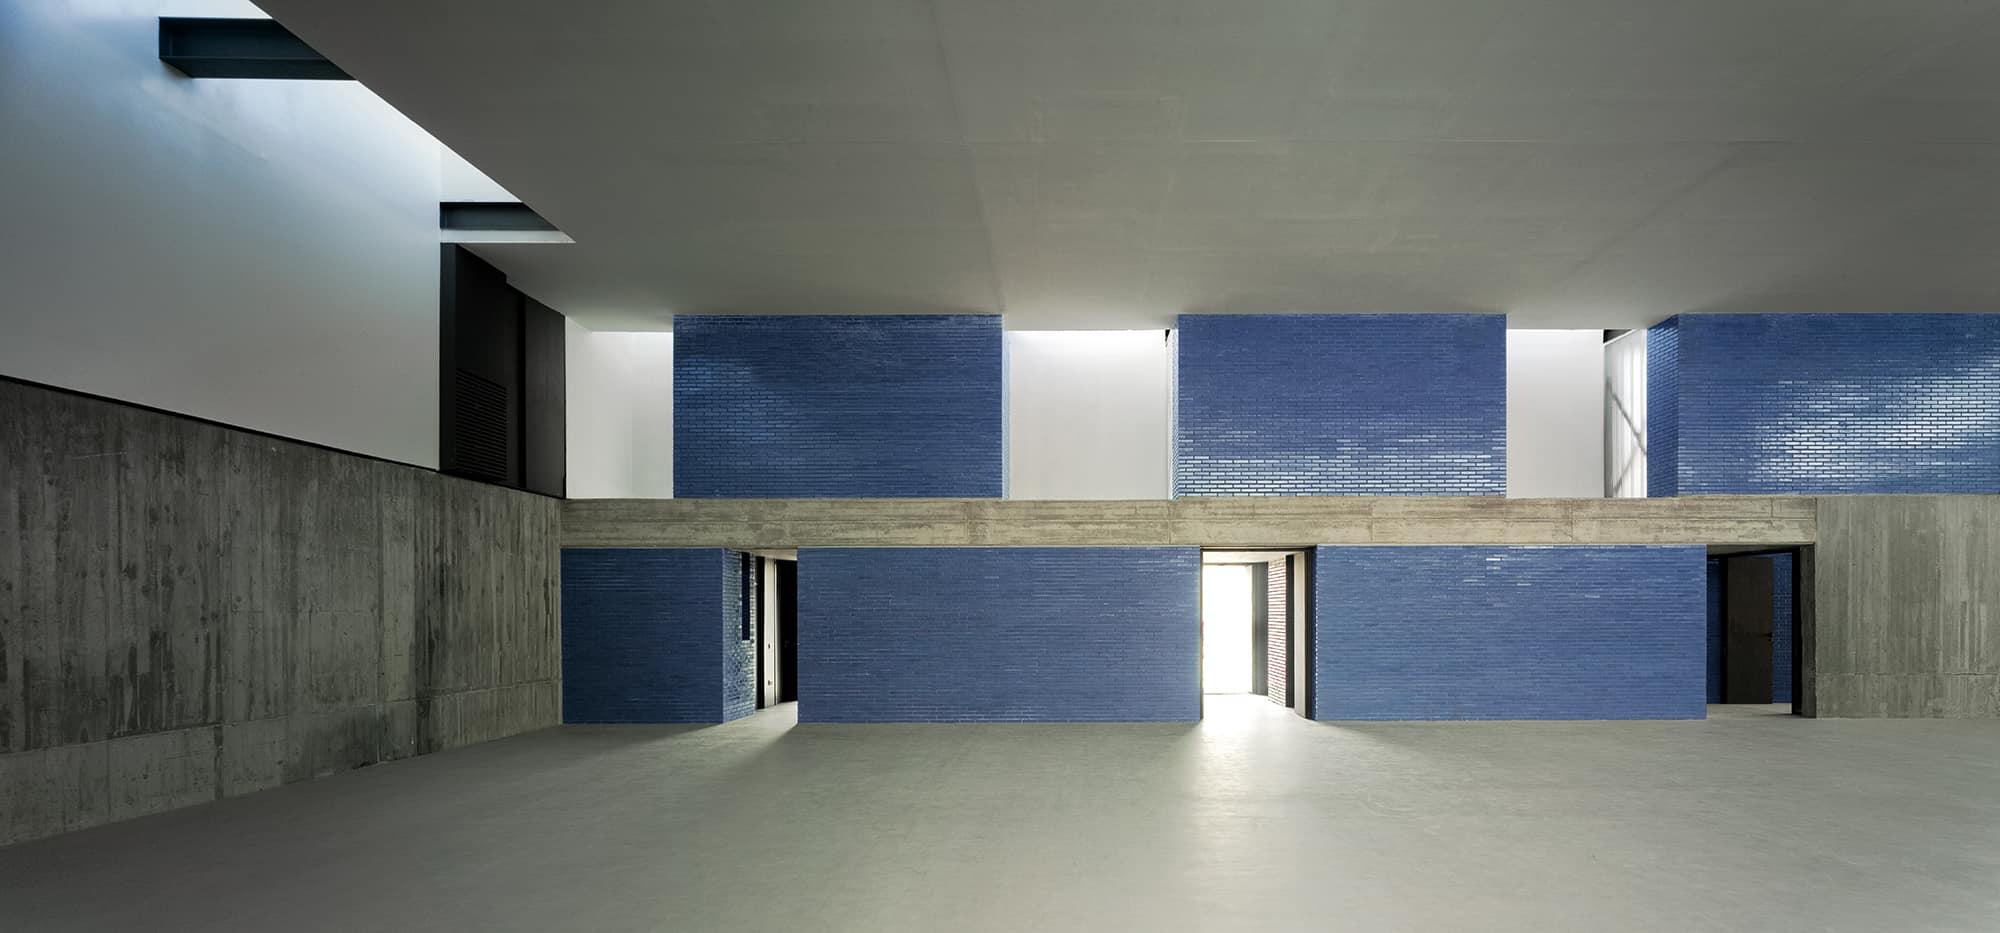 PABELLON GIMNASIA JARAIZ - arquitectura deportiva- LANDINEZ+REY | equipo L2G arquitectos, slp [ eL2Gaa ]